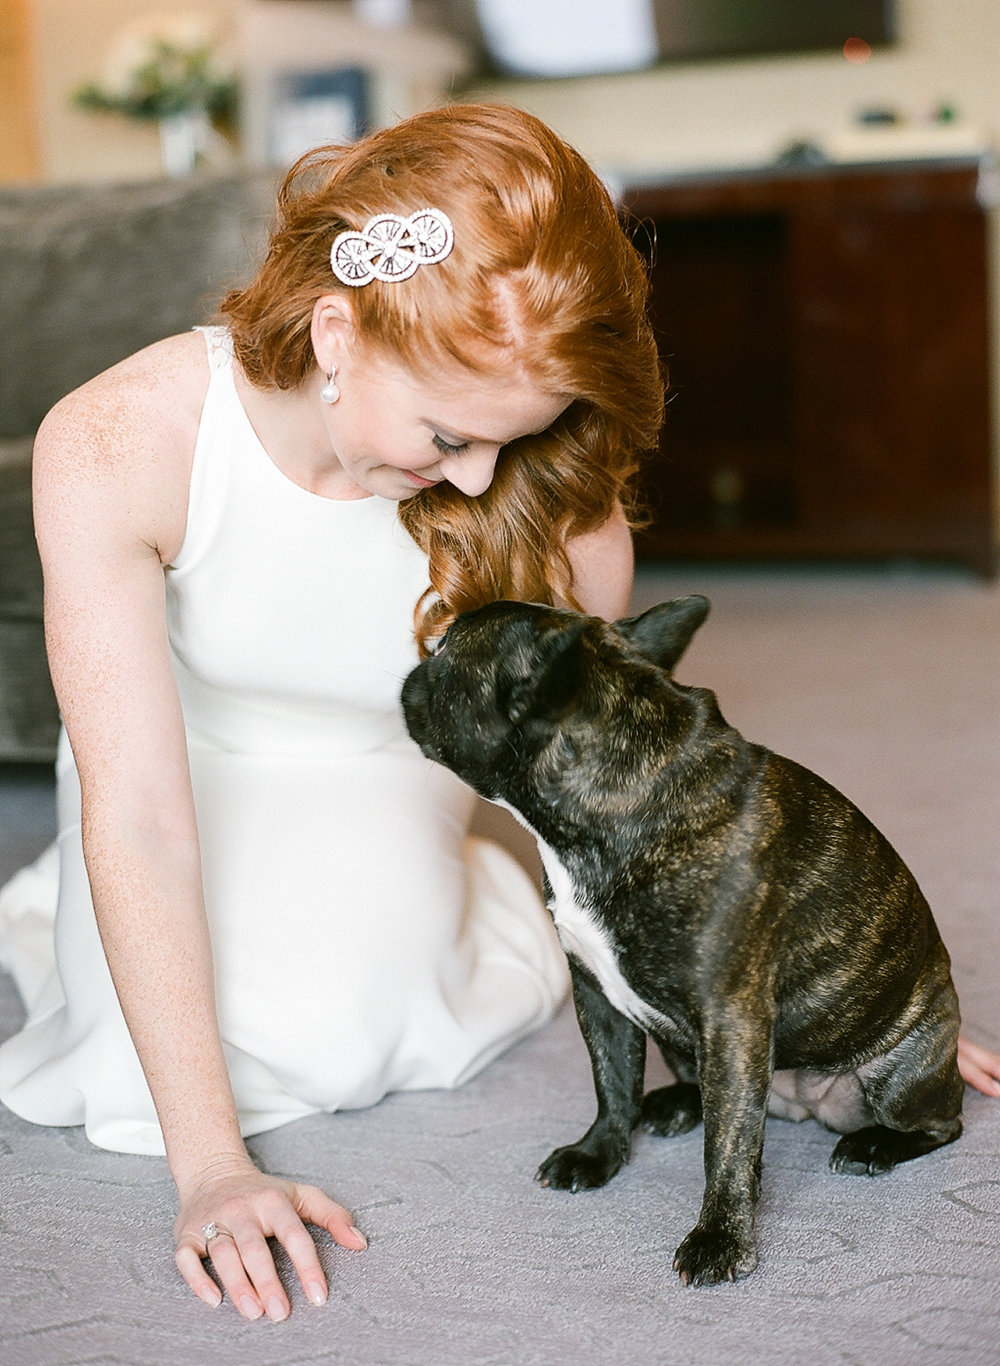 Bonphotage Boston Fine Art Wedding Photography